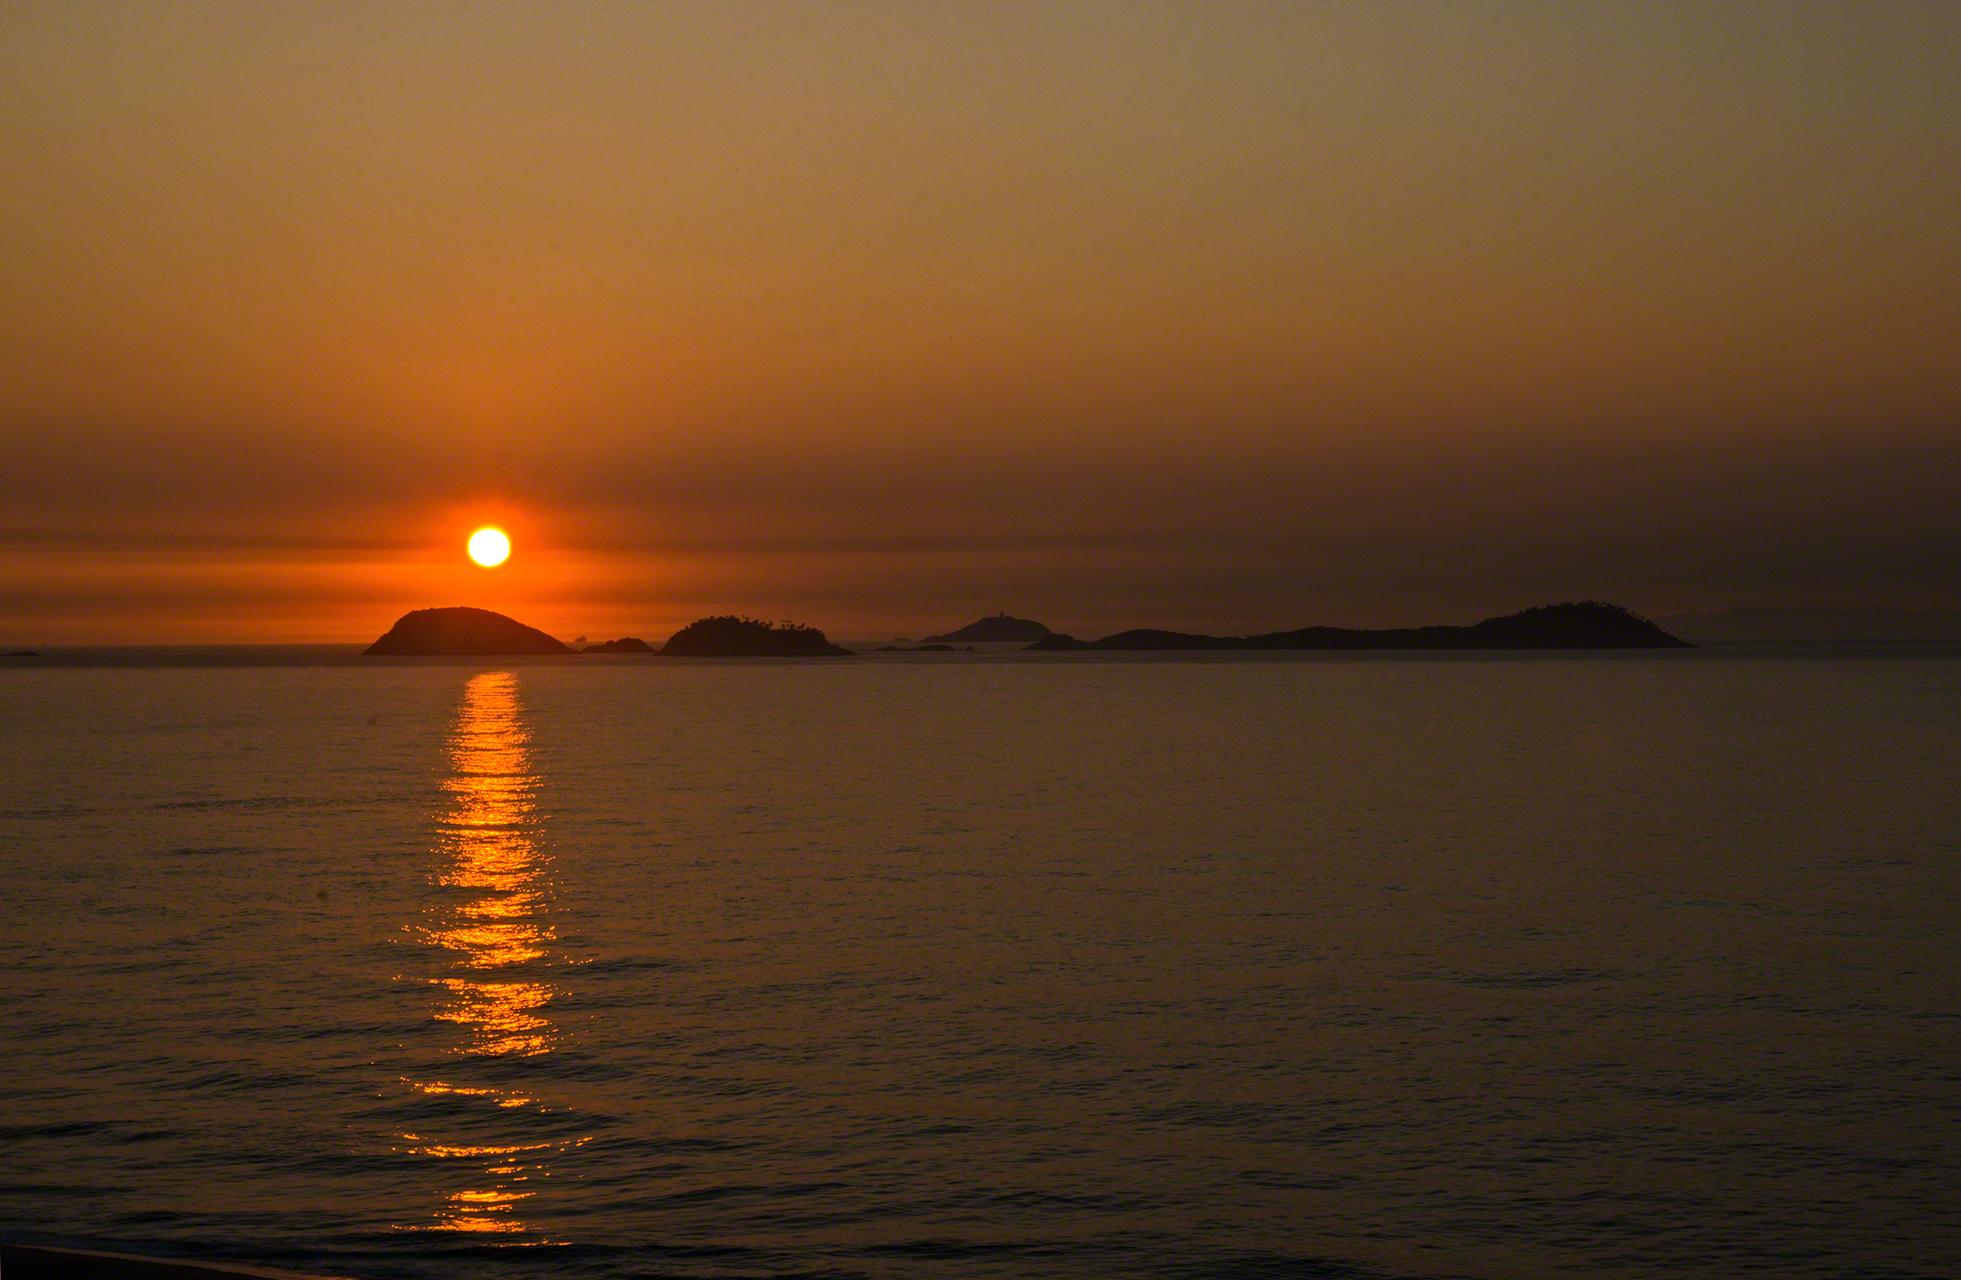 sunset photo in Rio, Brazil